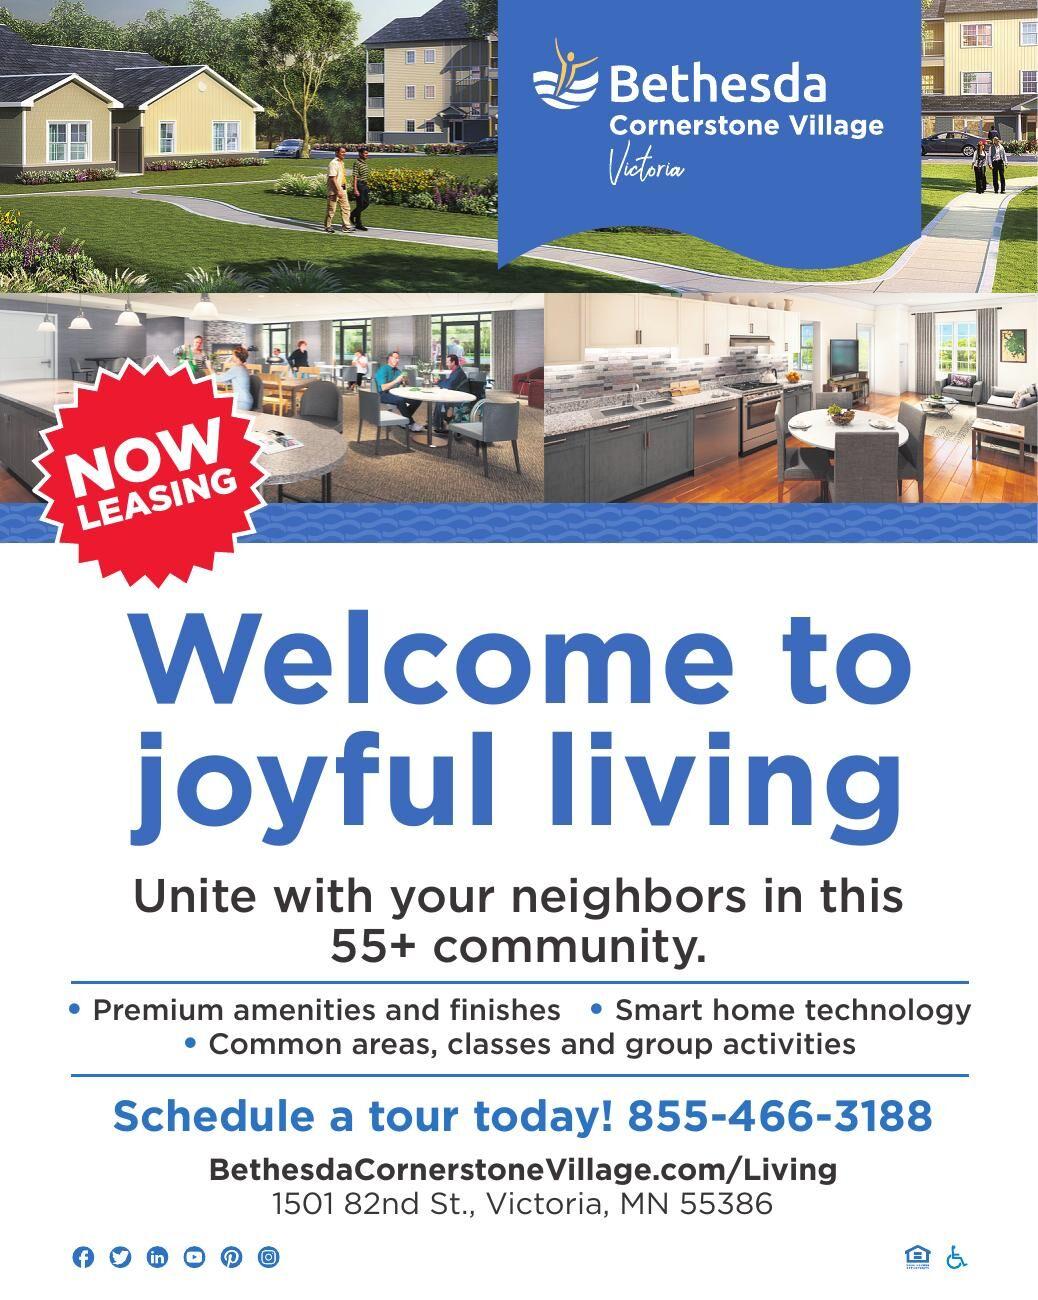 W G NEO ASIN L Welcome to joyful living